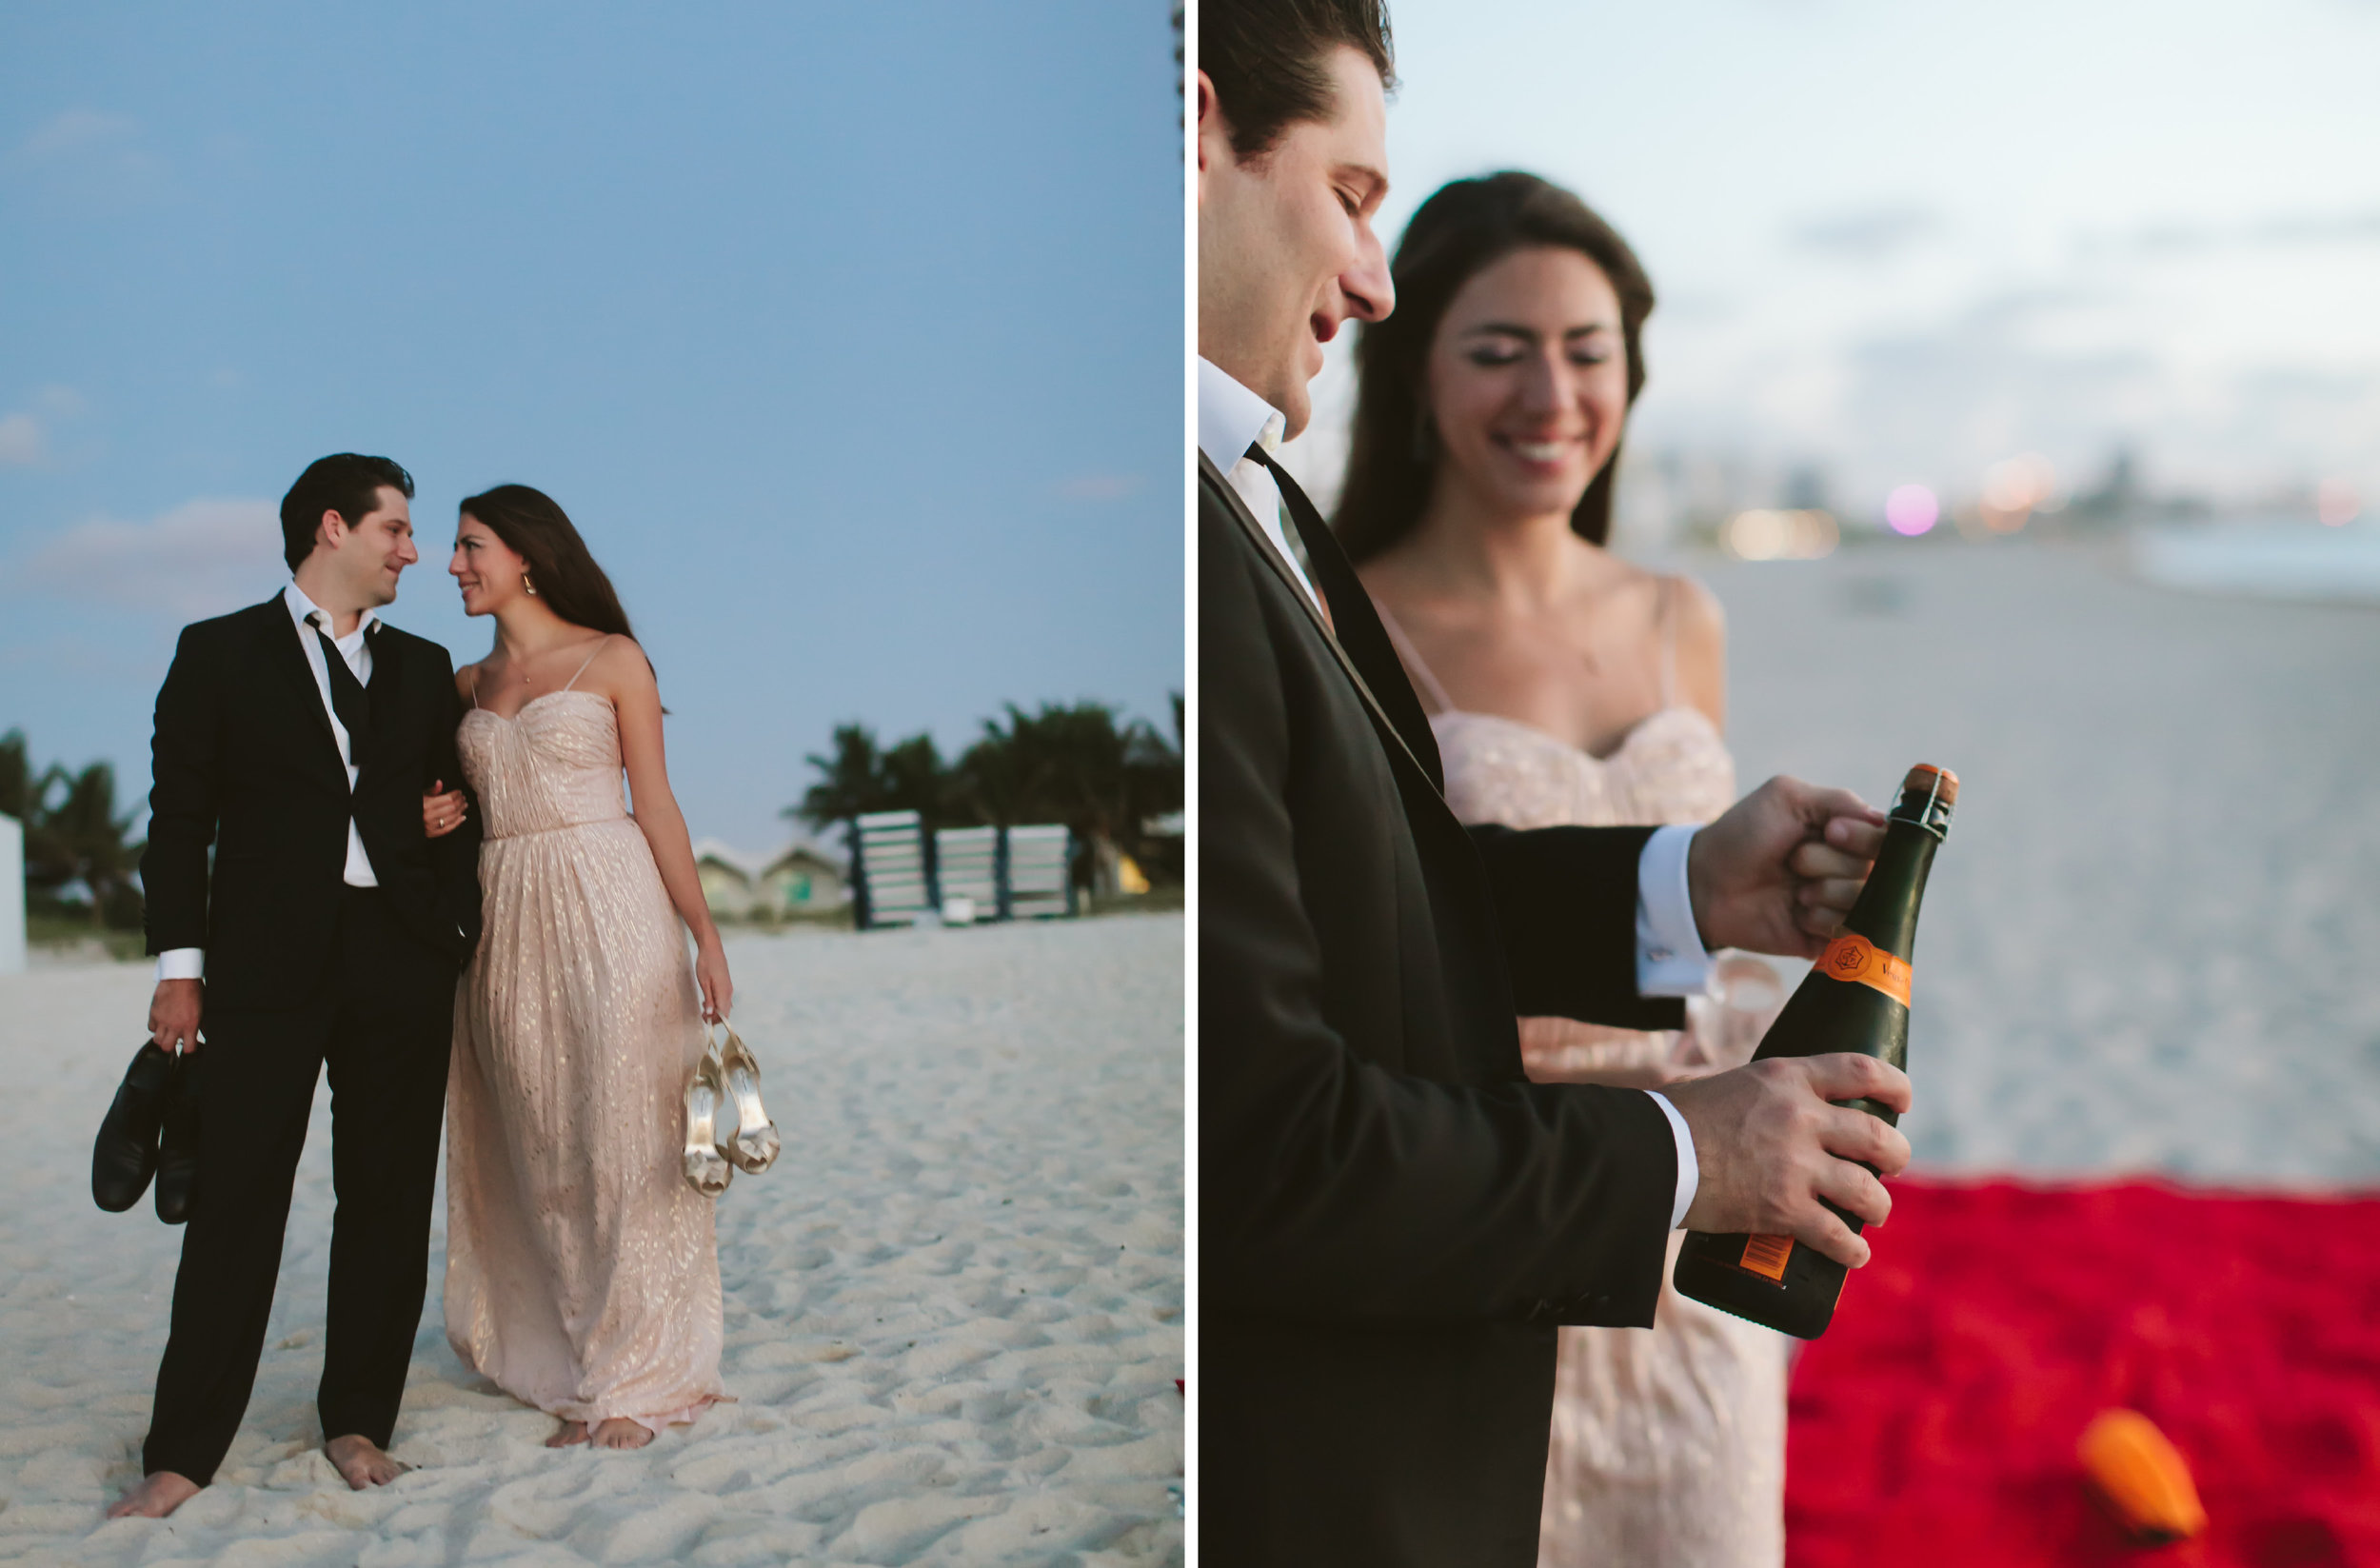 Meli + Mike South Pointe Park South Beach Miami Engagement Shoot3.jpg